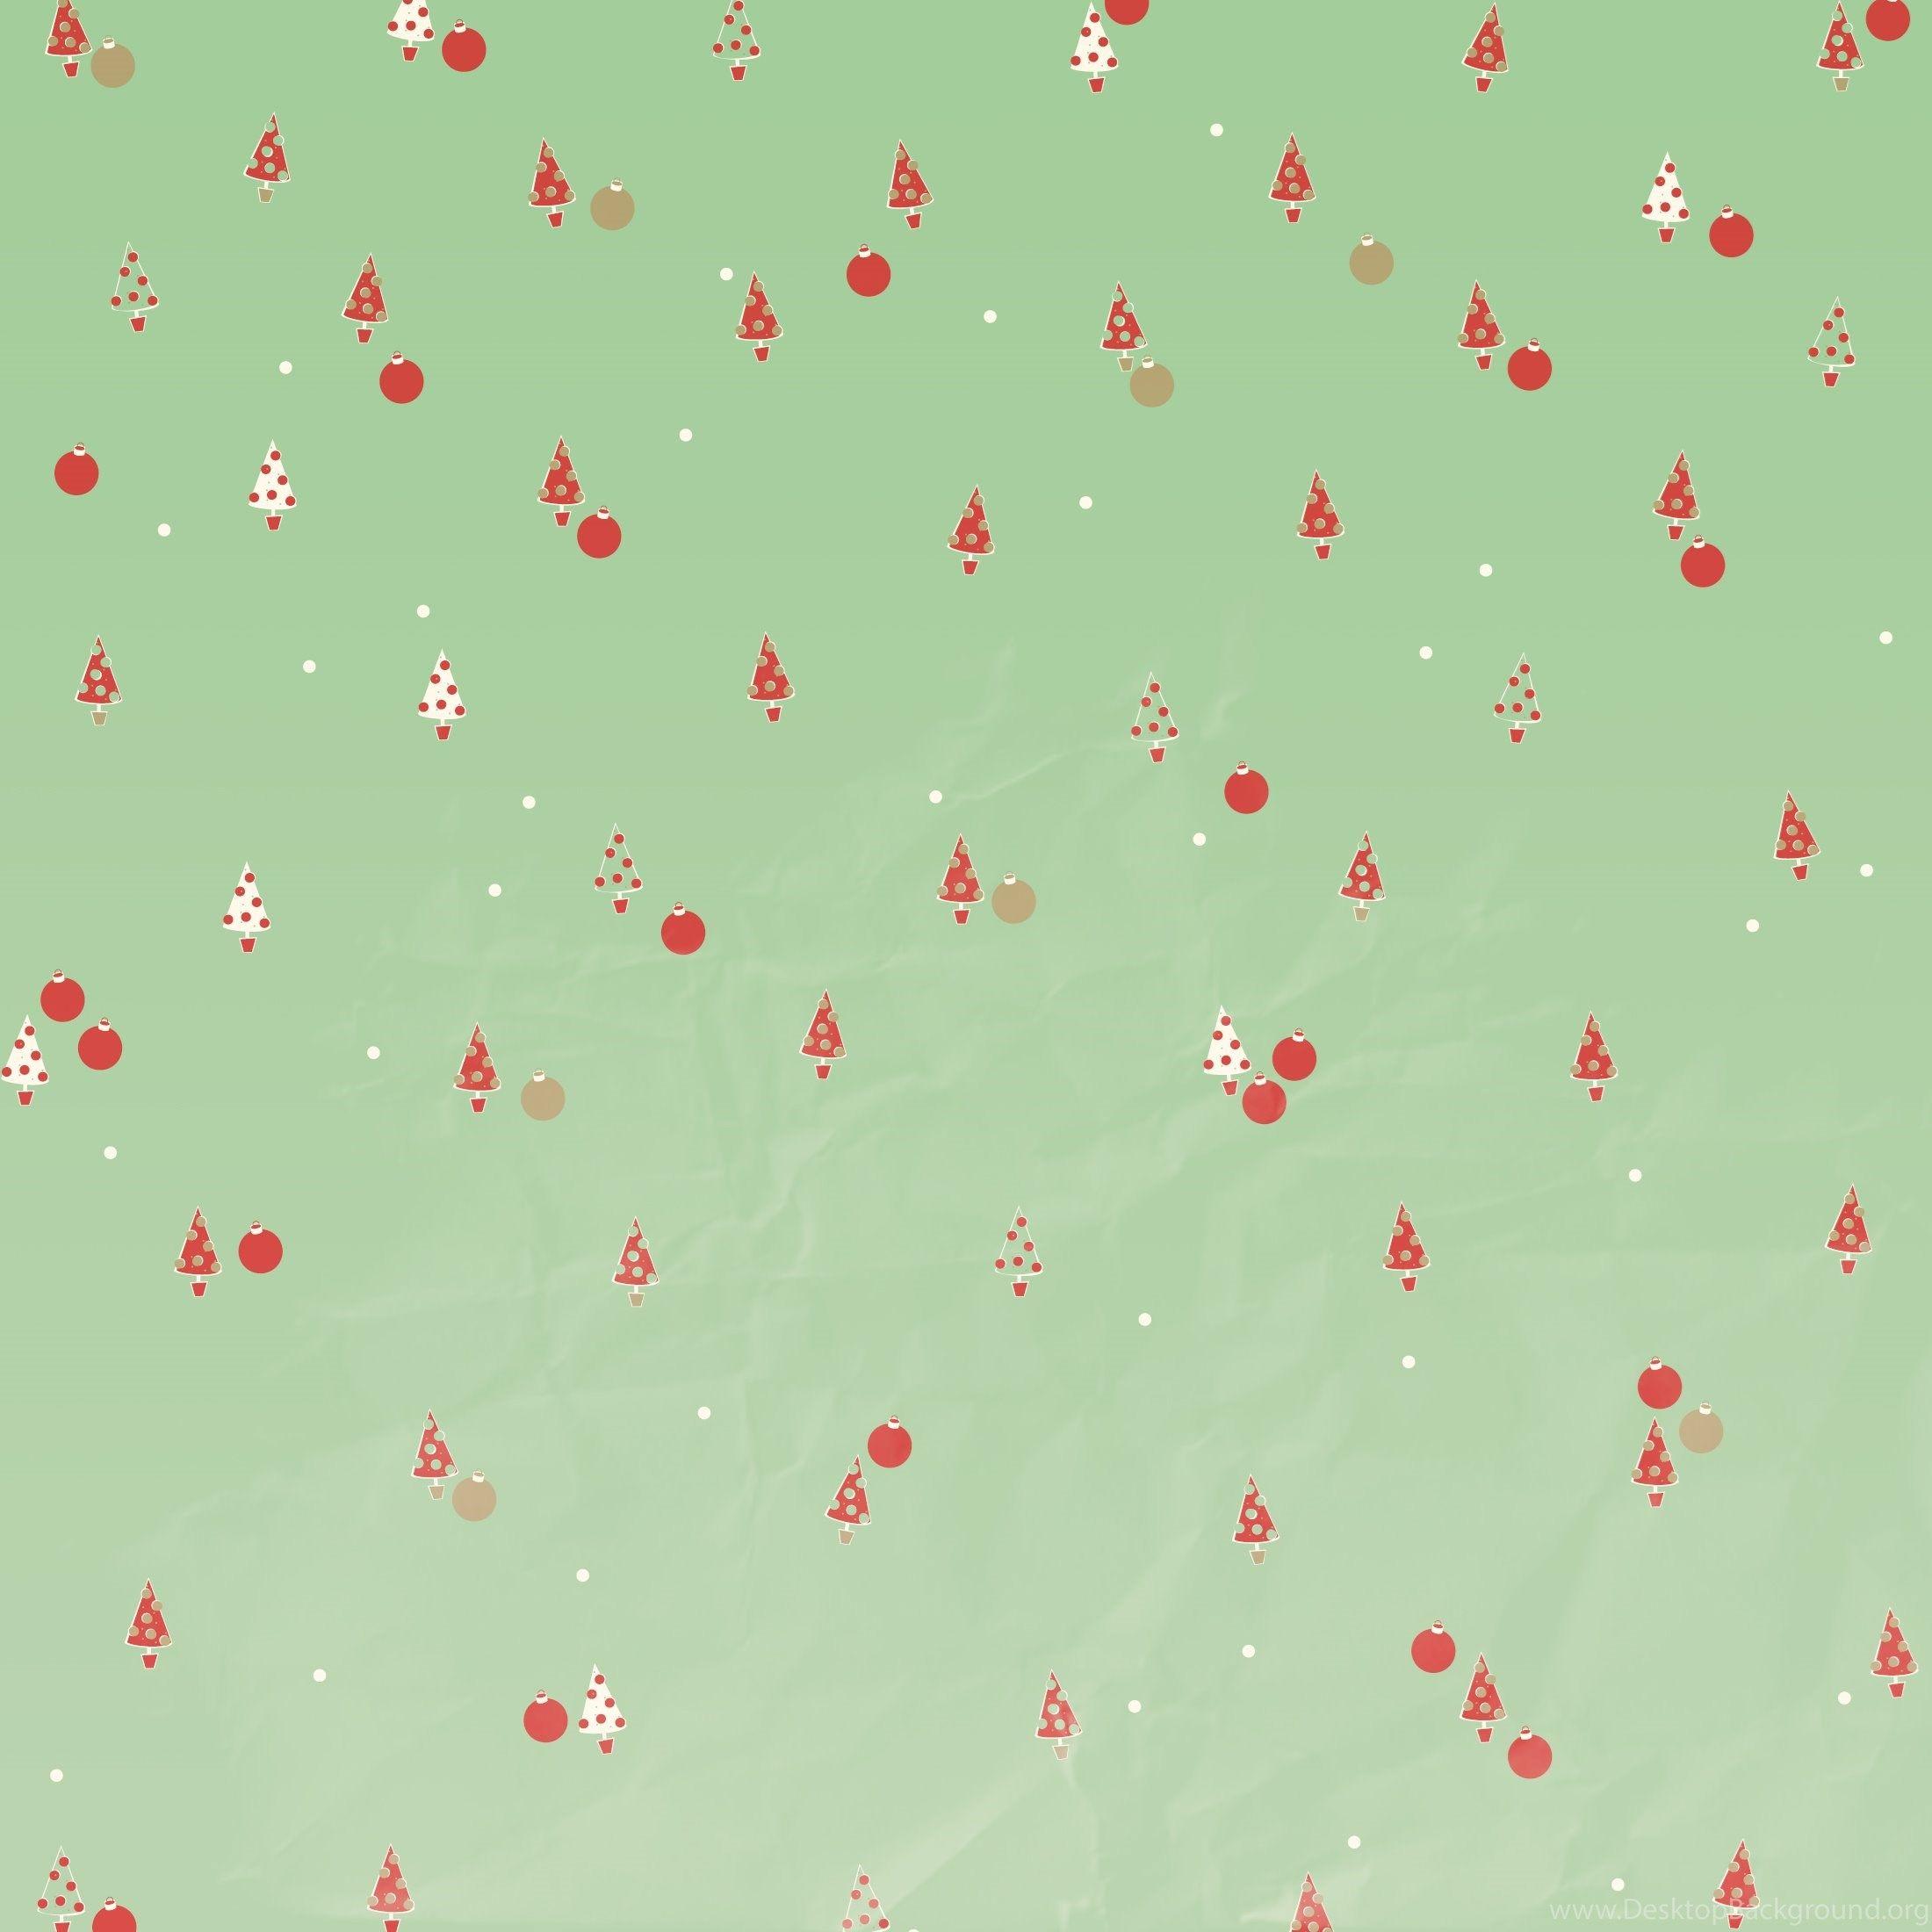 Free Download 30 Cute Christmas Desktop Wallpapers Download At Wallpaperbro 2200x2200 For Your Desktop Mobile Tablet Explore 56 Christmas Desktop Cute Wallpapers Cute Christmas Backgrounds Cute Christmas Background Cute Christmas Wallpapers